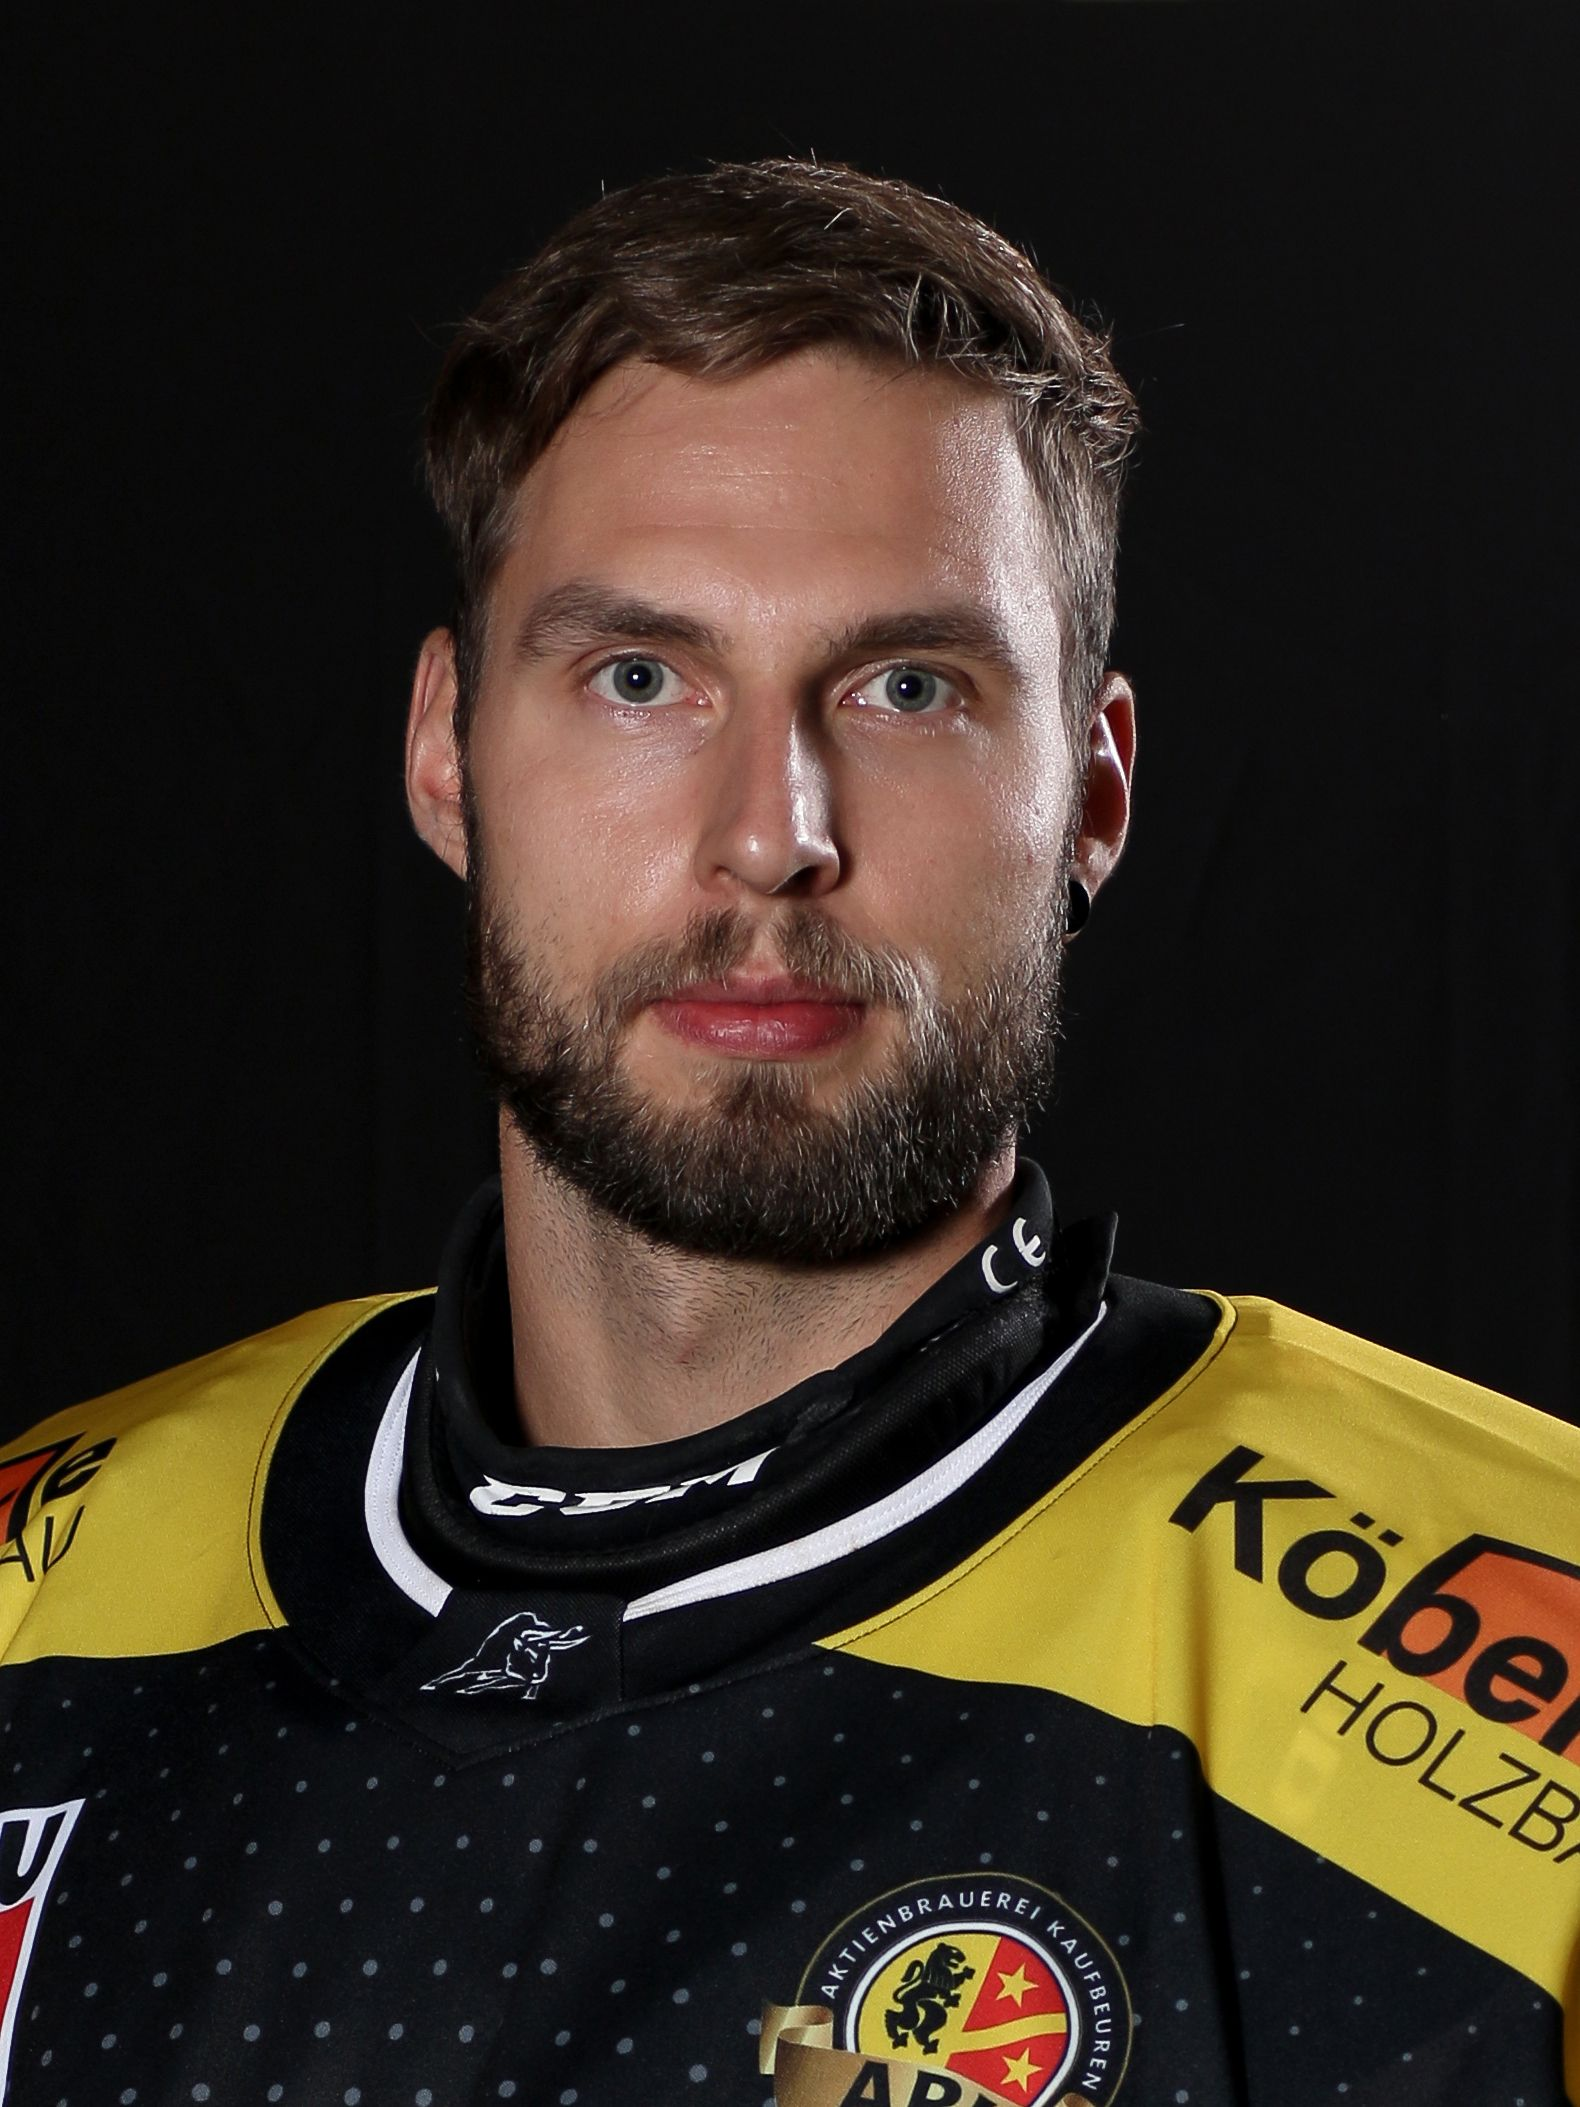 Dominik Bauer